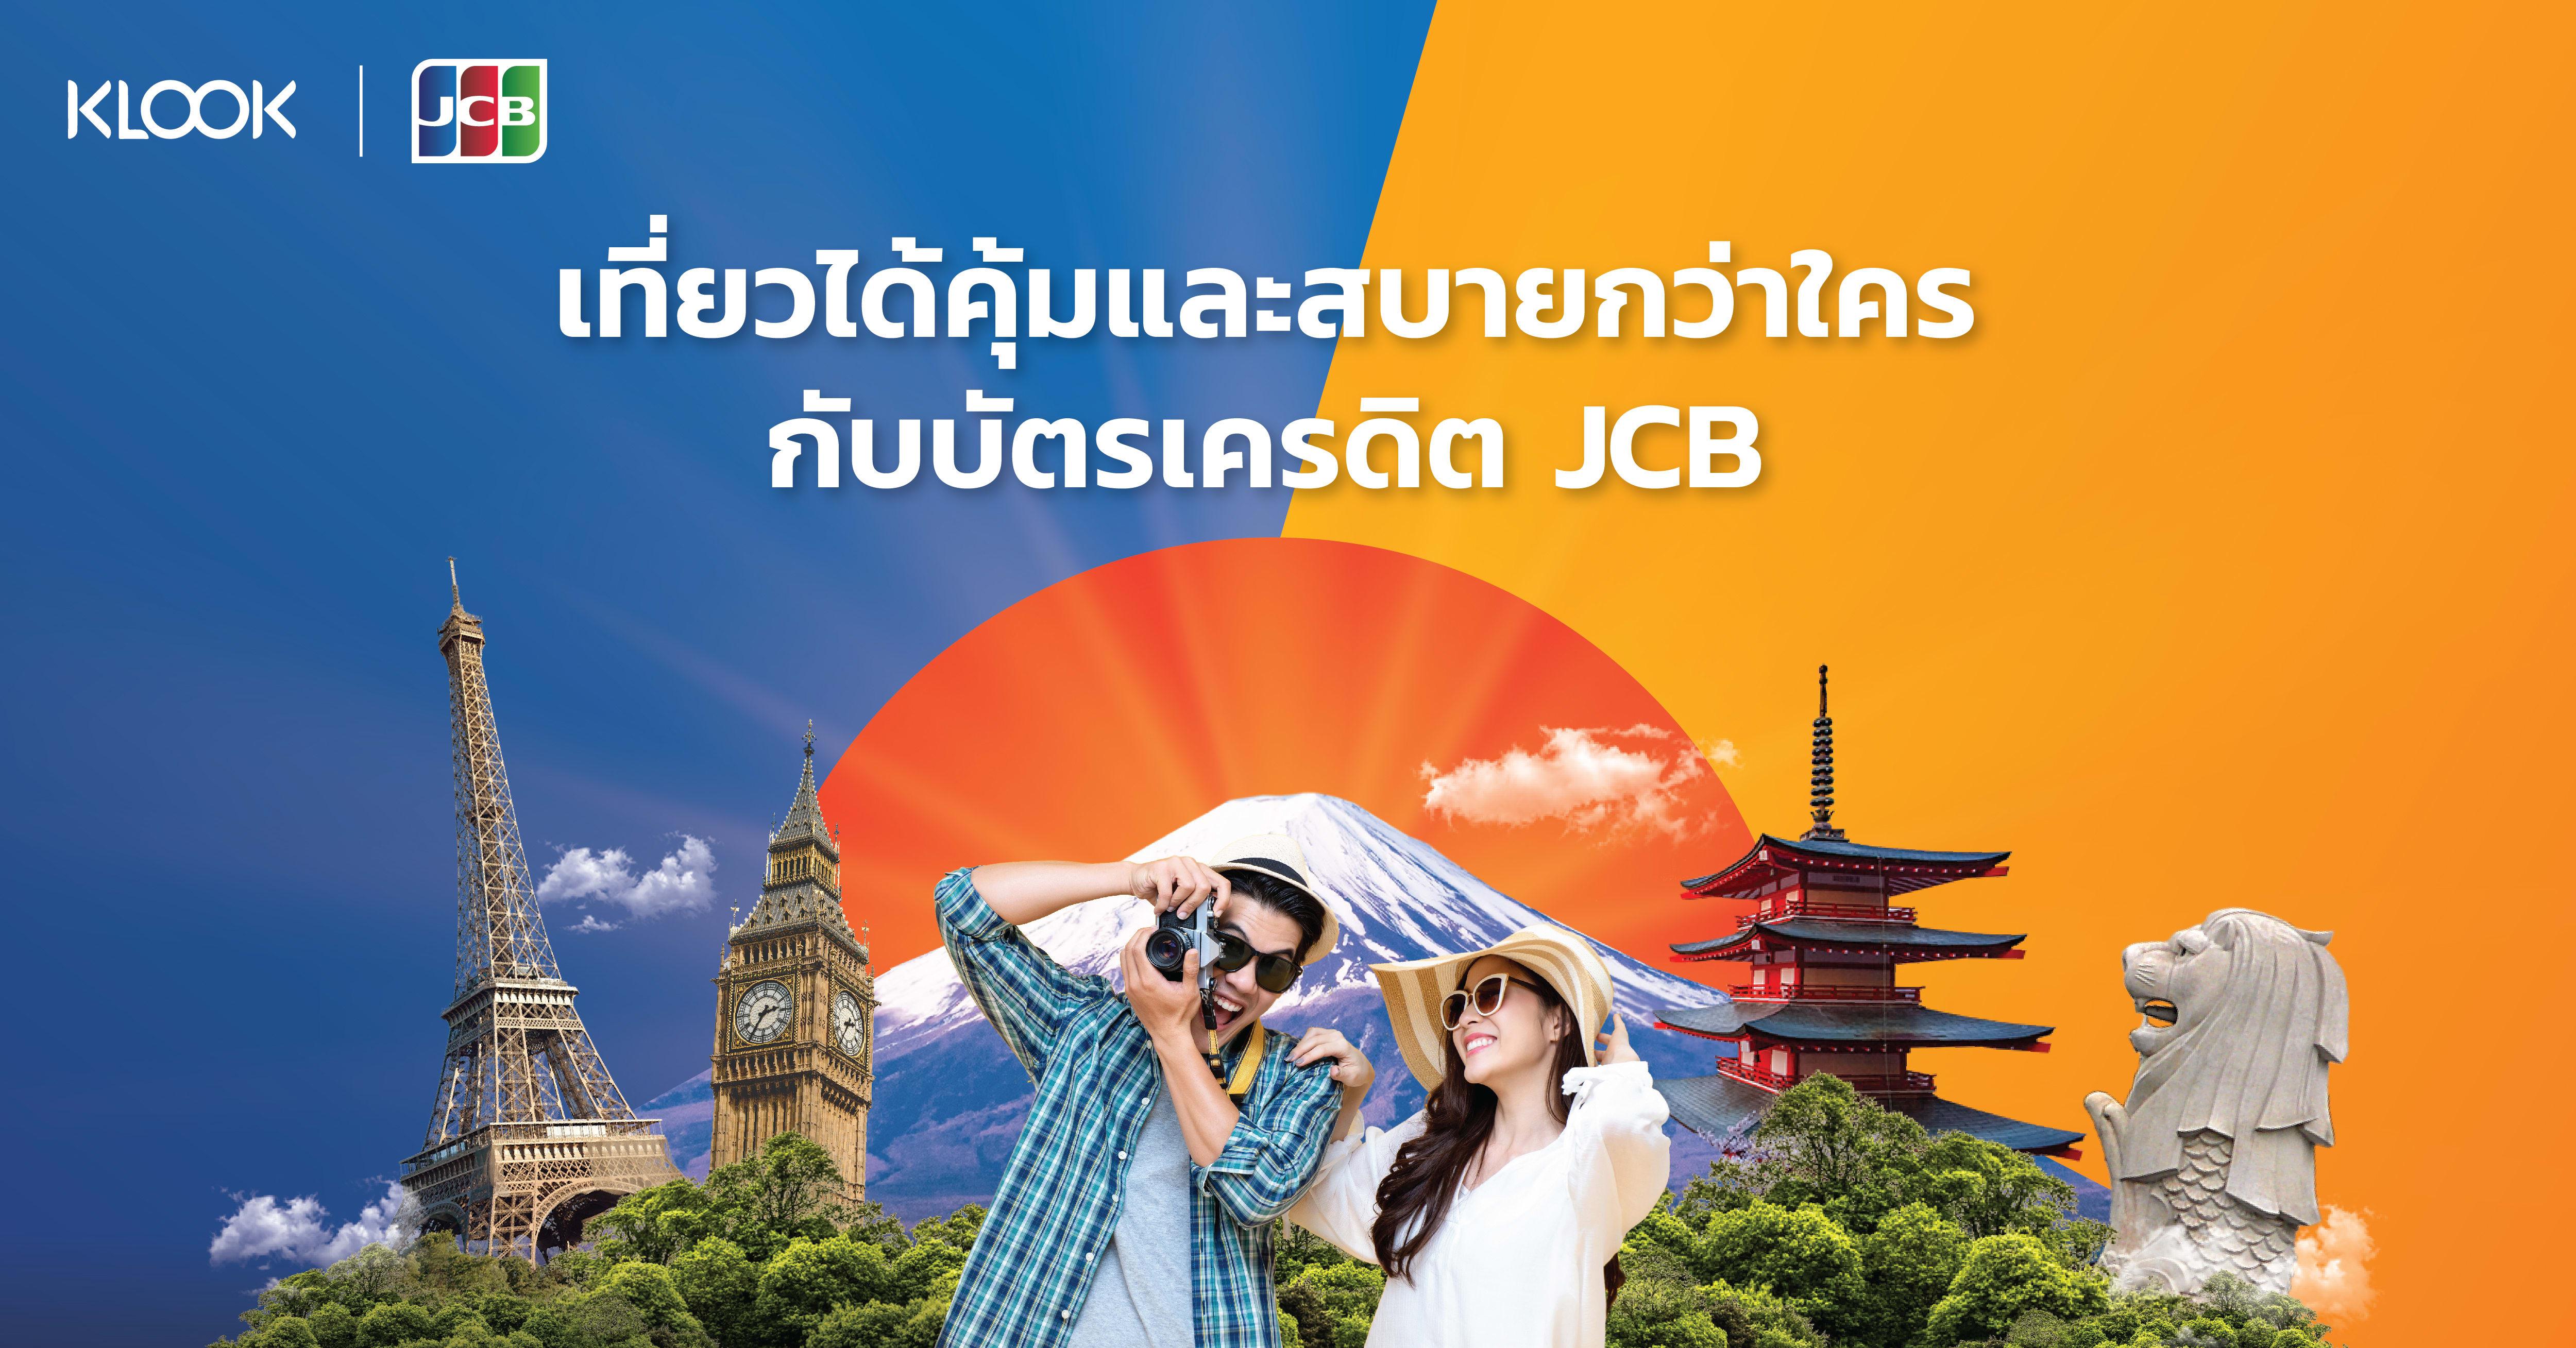 Jcb blog